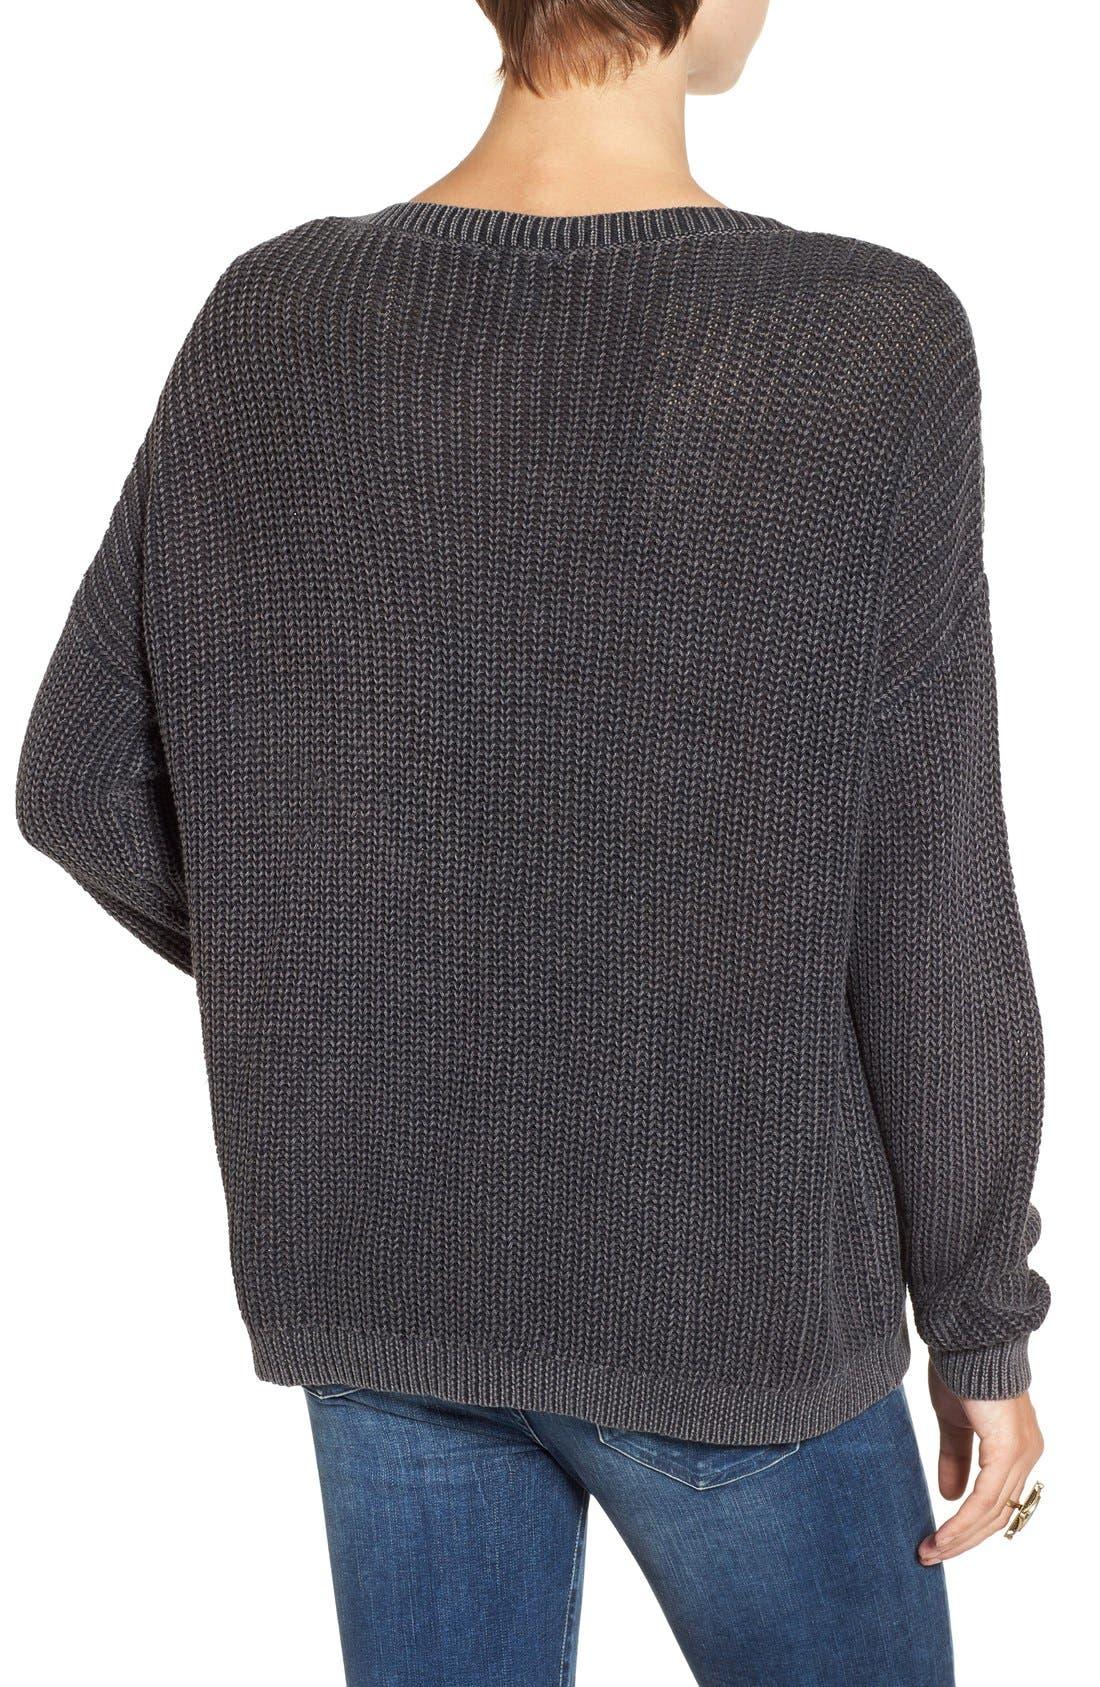 Alternate Image 2  - BP. V-Neck Cable Knit Pullover